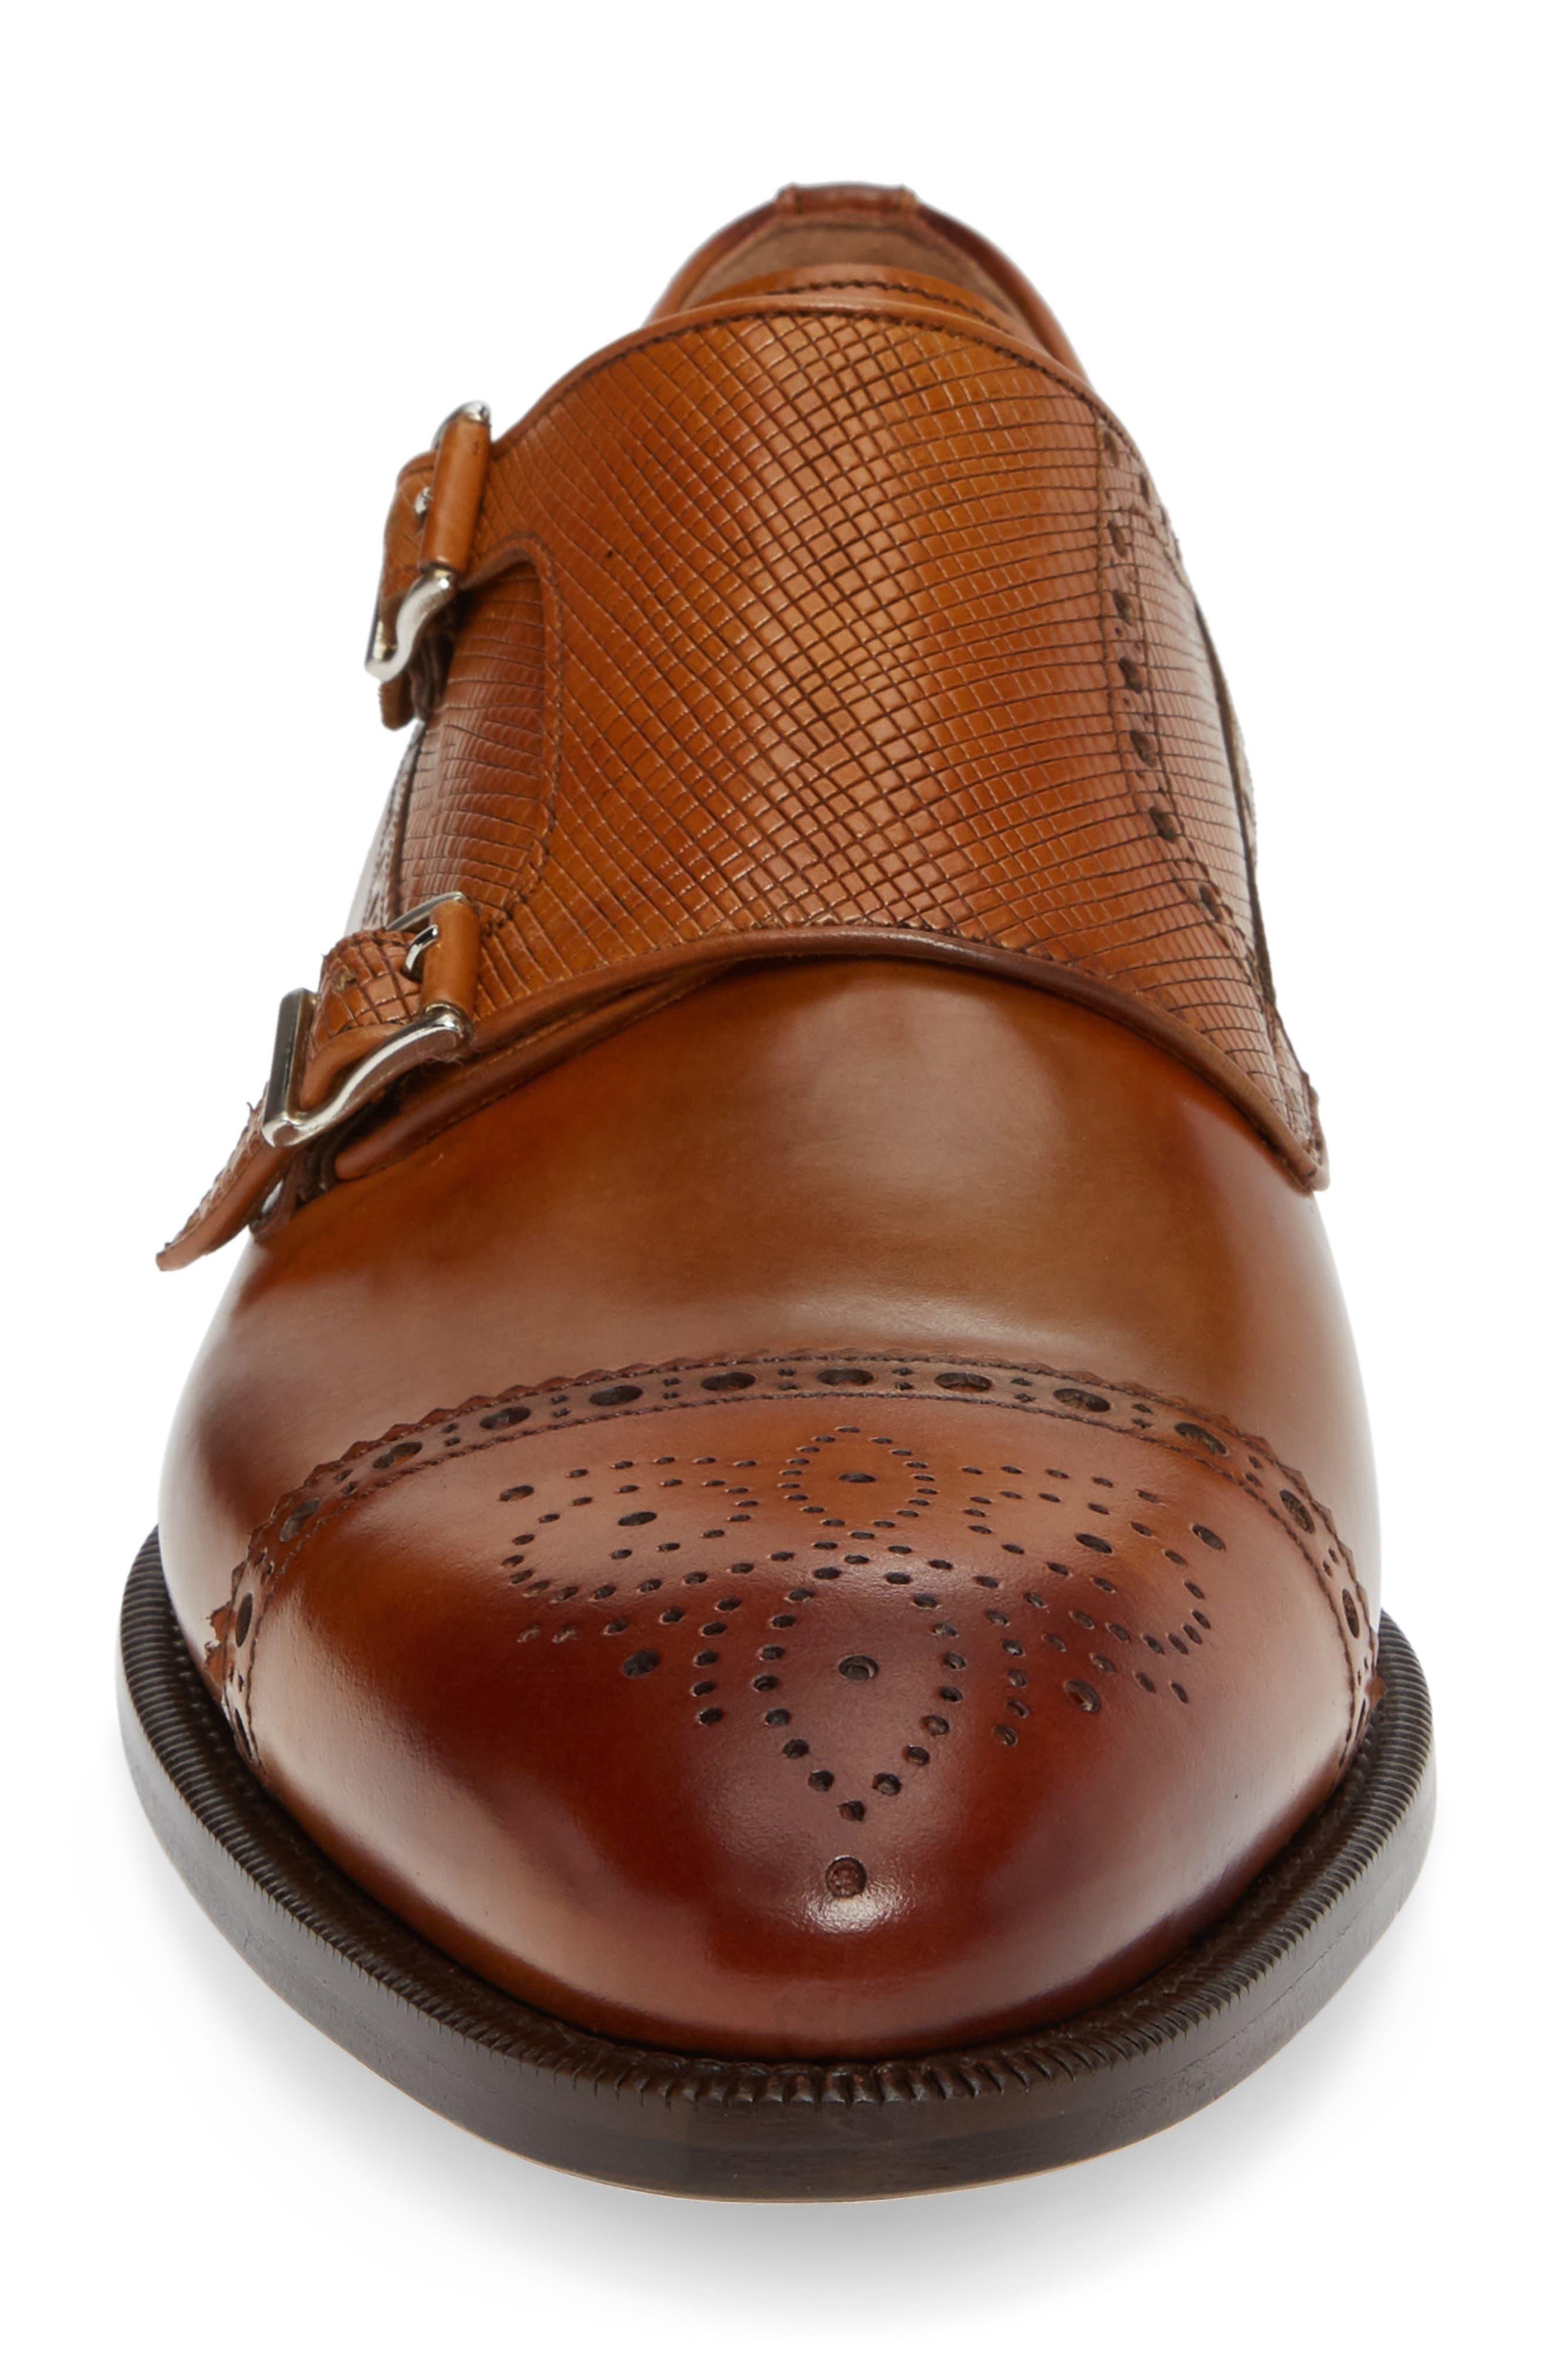 Valda Double Strap Cap Toe Monk Shoe,                             Alternate thumbnail 4, color,                             BROWN LEATHER